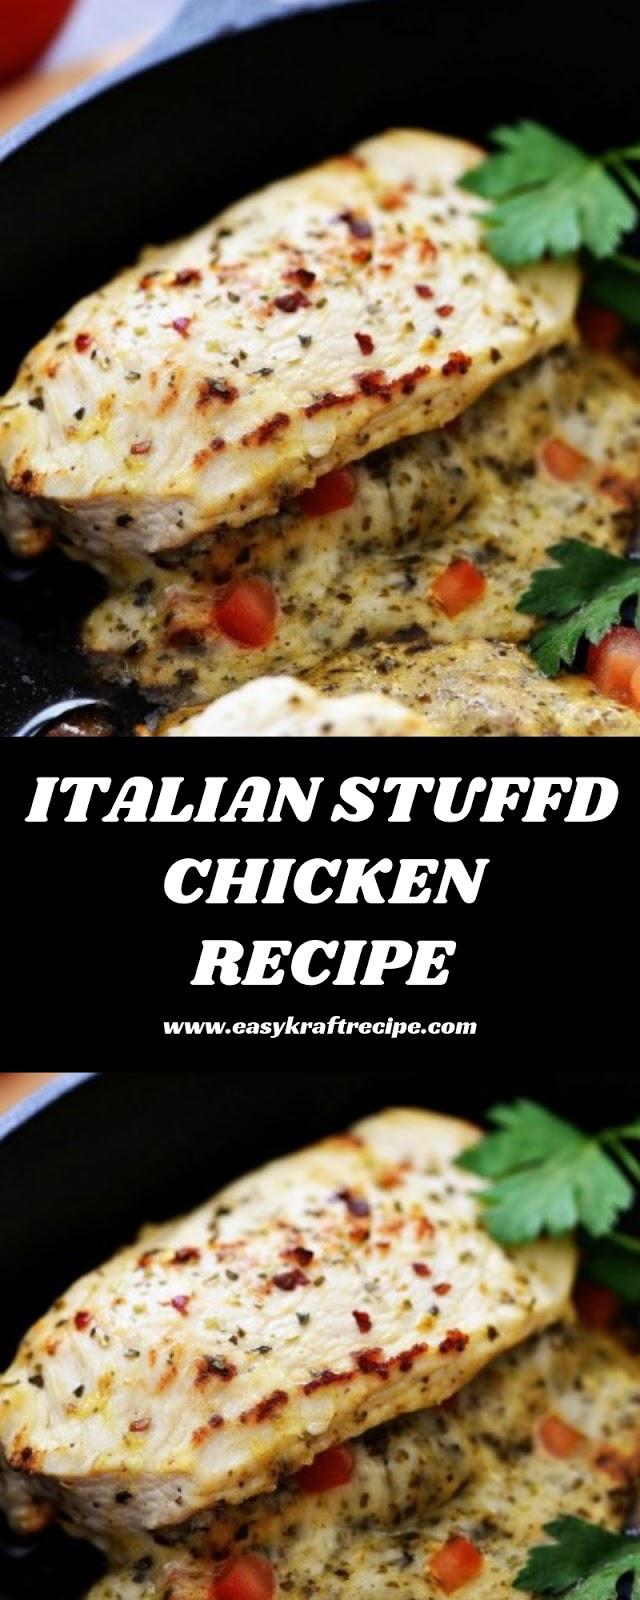 ITALIAN STUFFD CHICKEN RECIPE